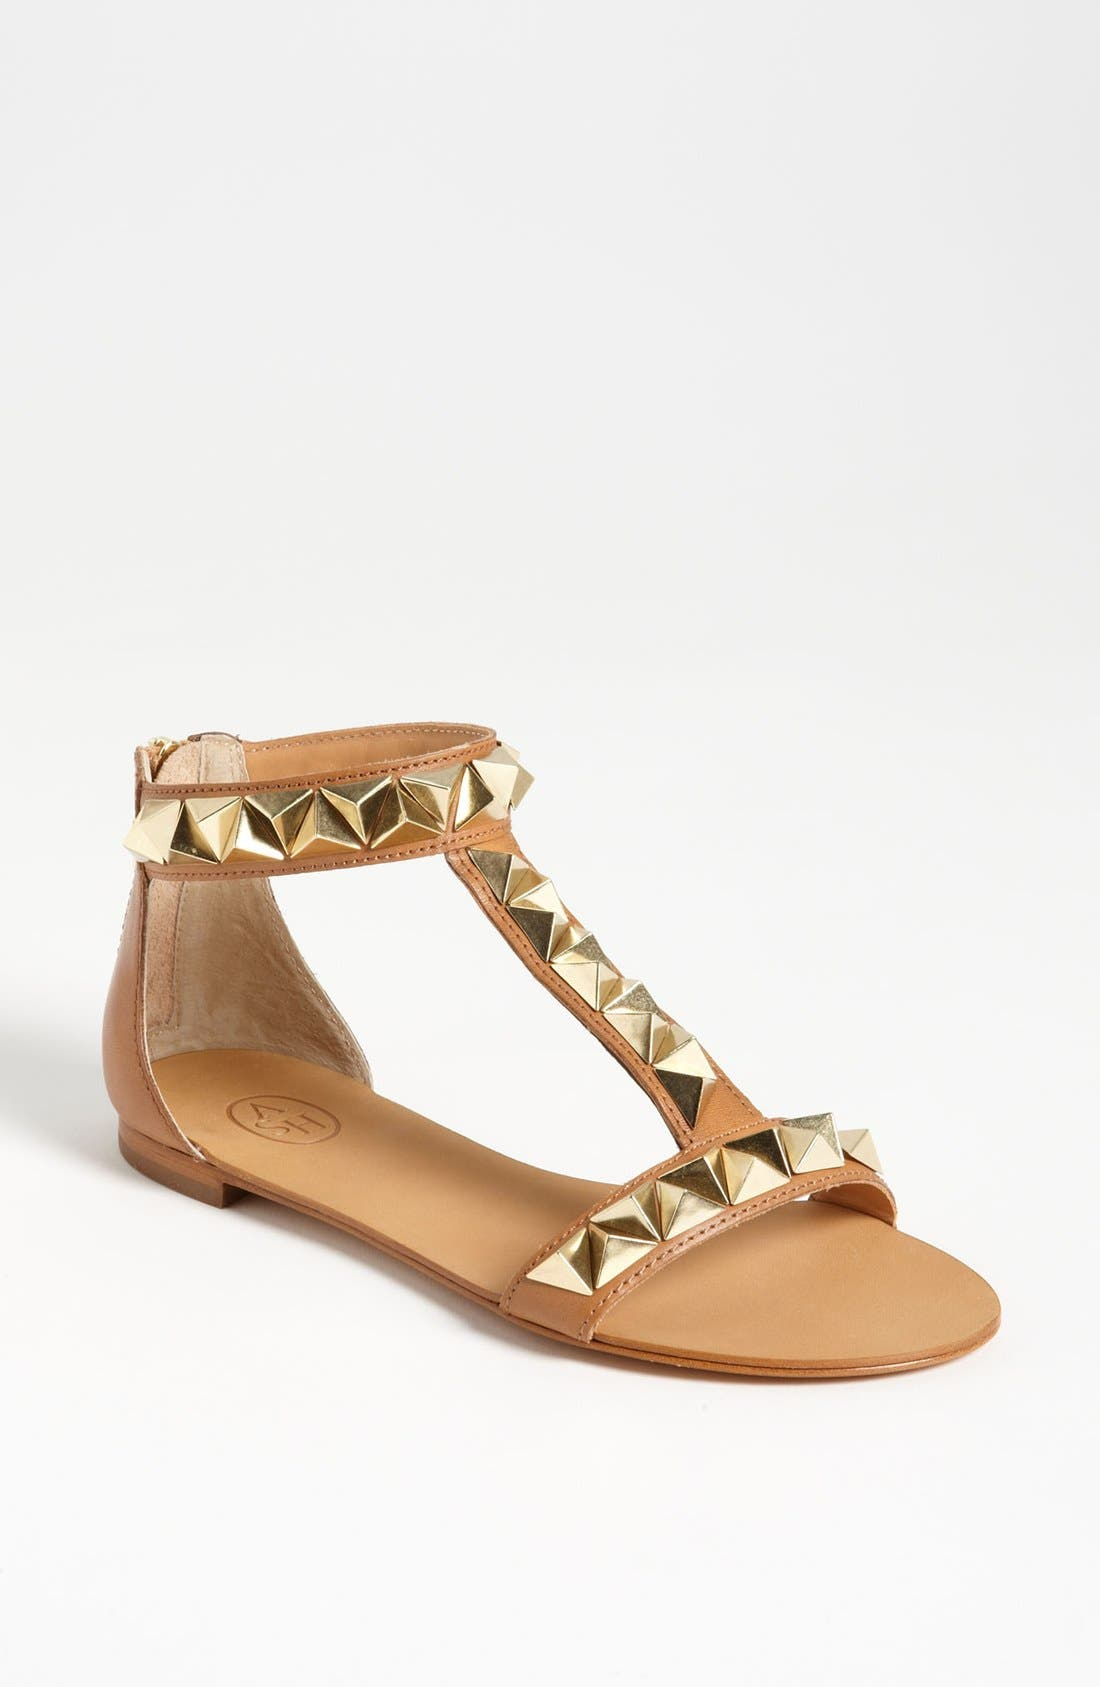 Alternate Image 1 Selected - Ash 'Mosaic' Sandal